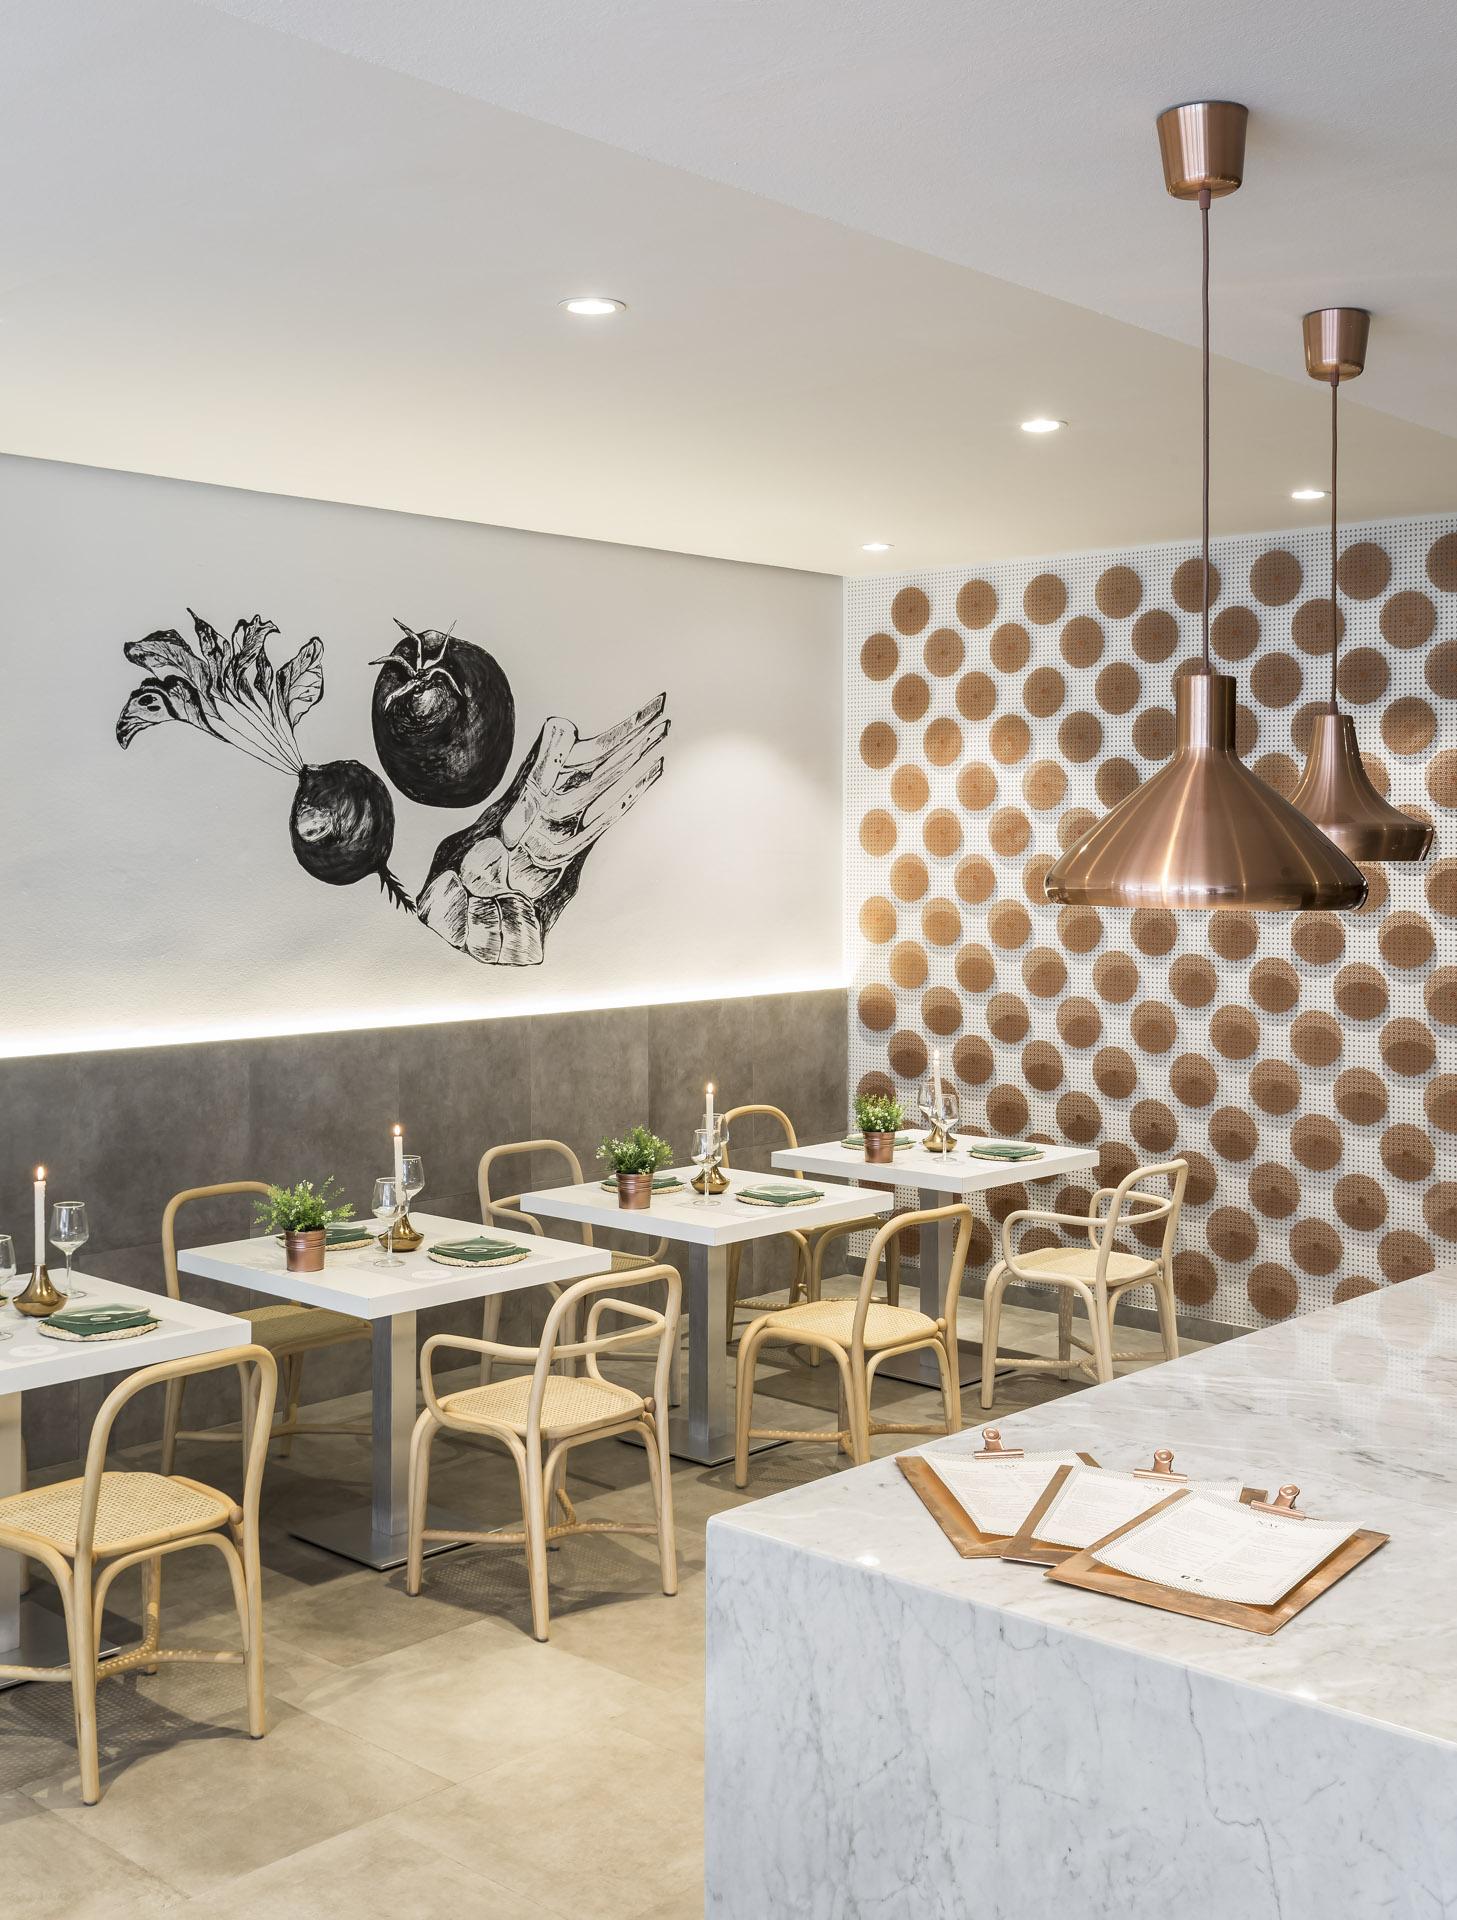 fotografia-arquitectura-valencia-german-cabo-estudihac-restaurante-nac-ontinyent-10